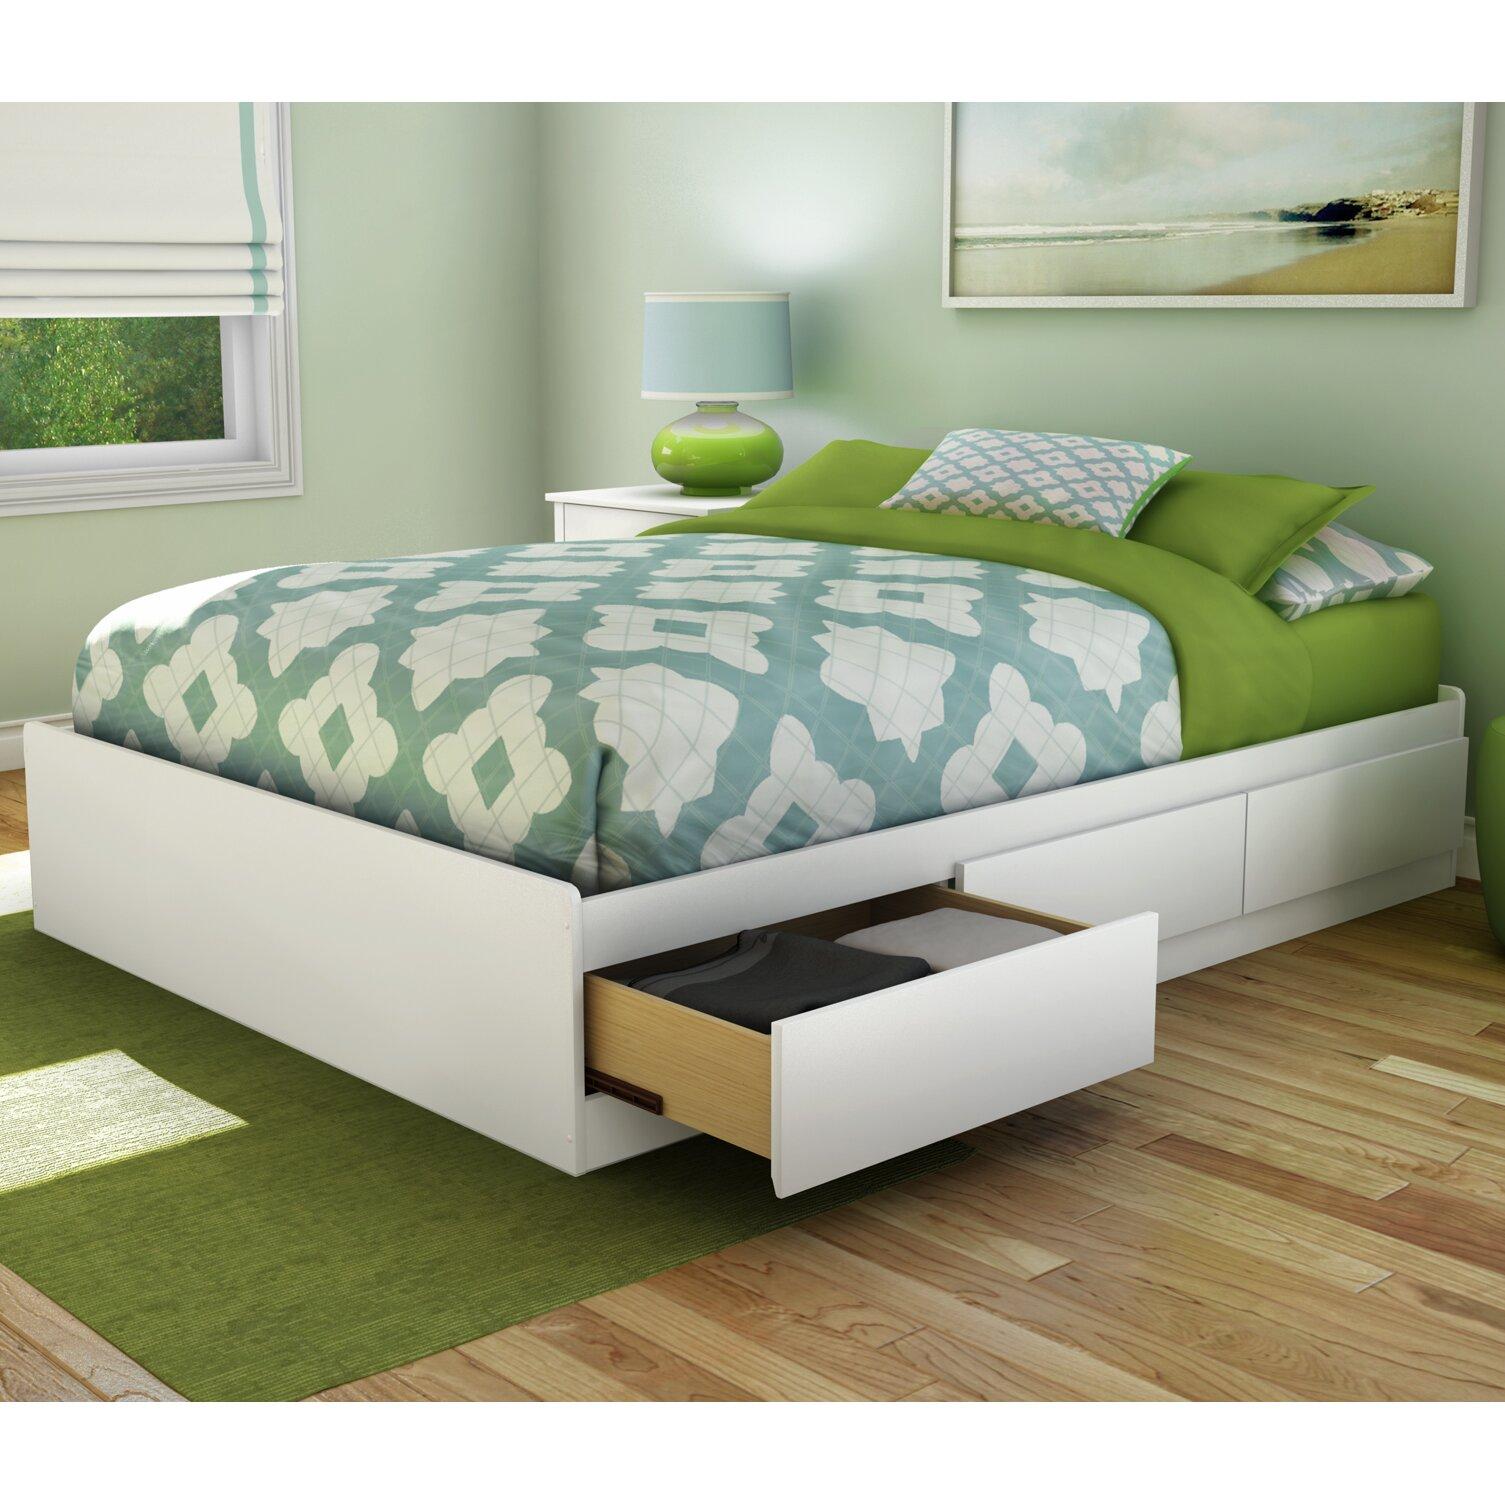 Room and board platform bed - Step One Full Double Storage Platform Bed